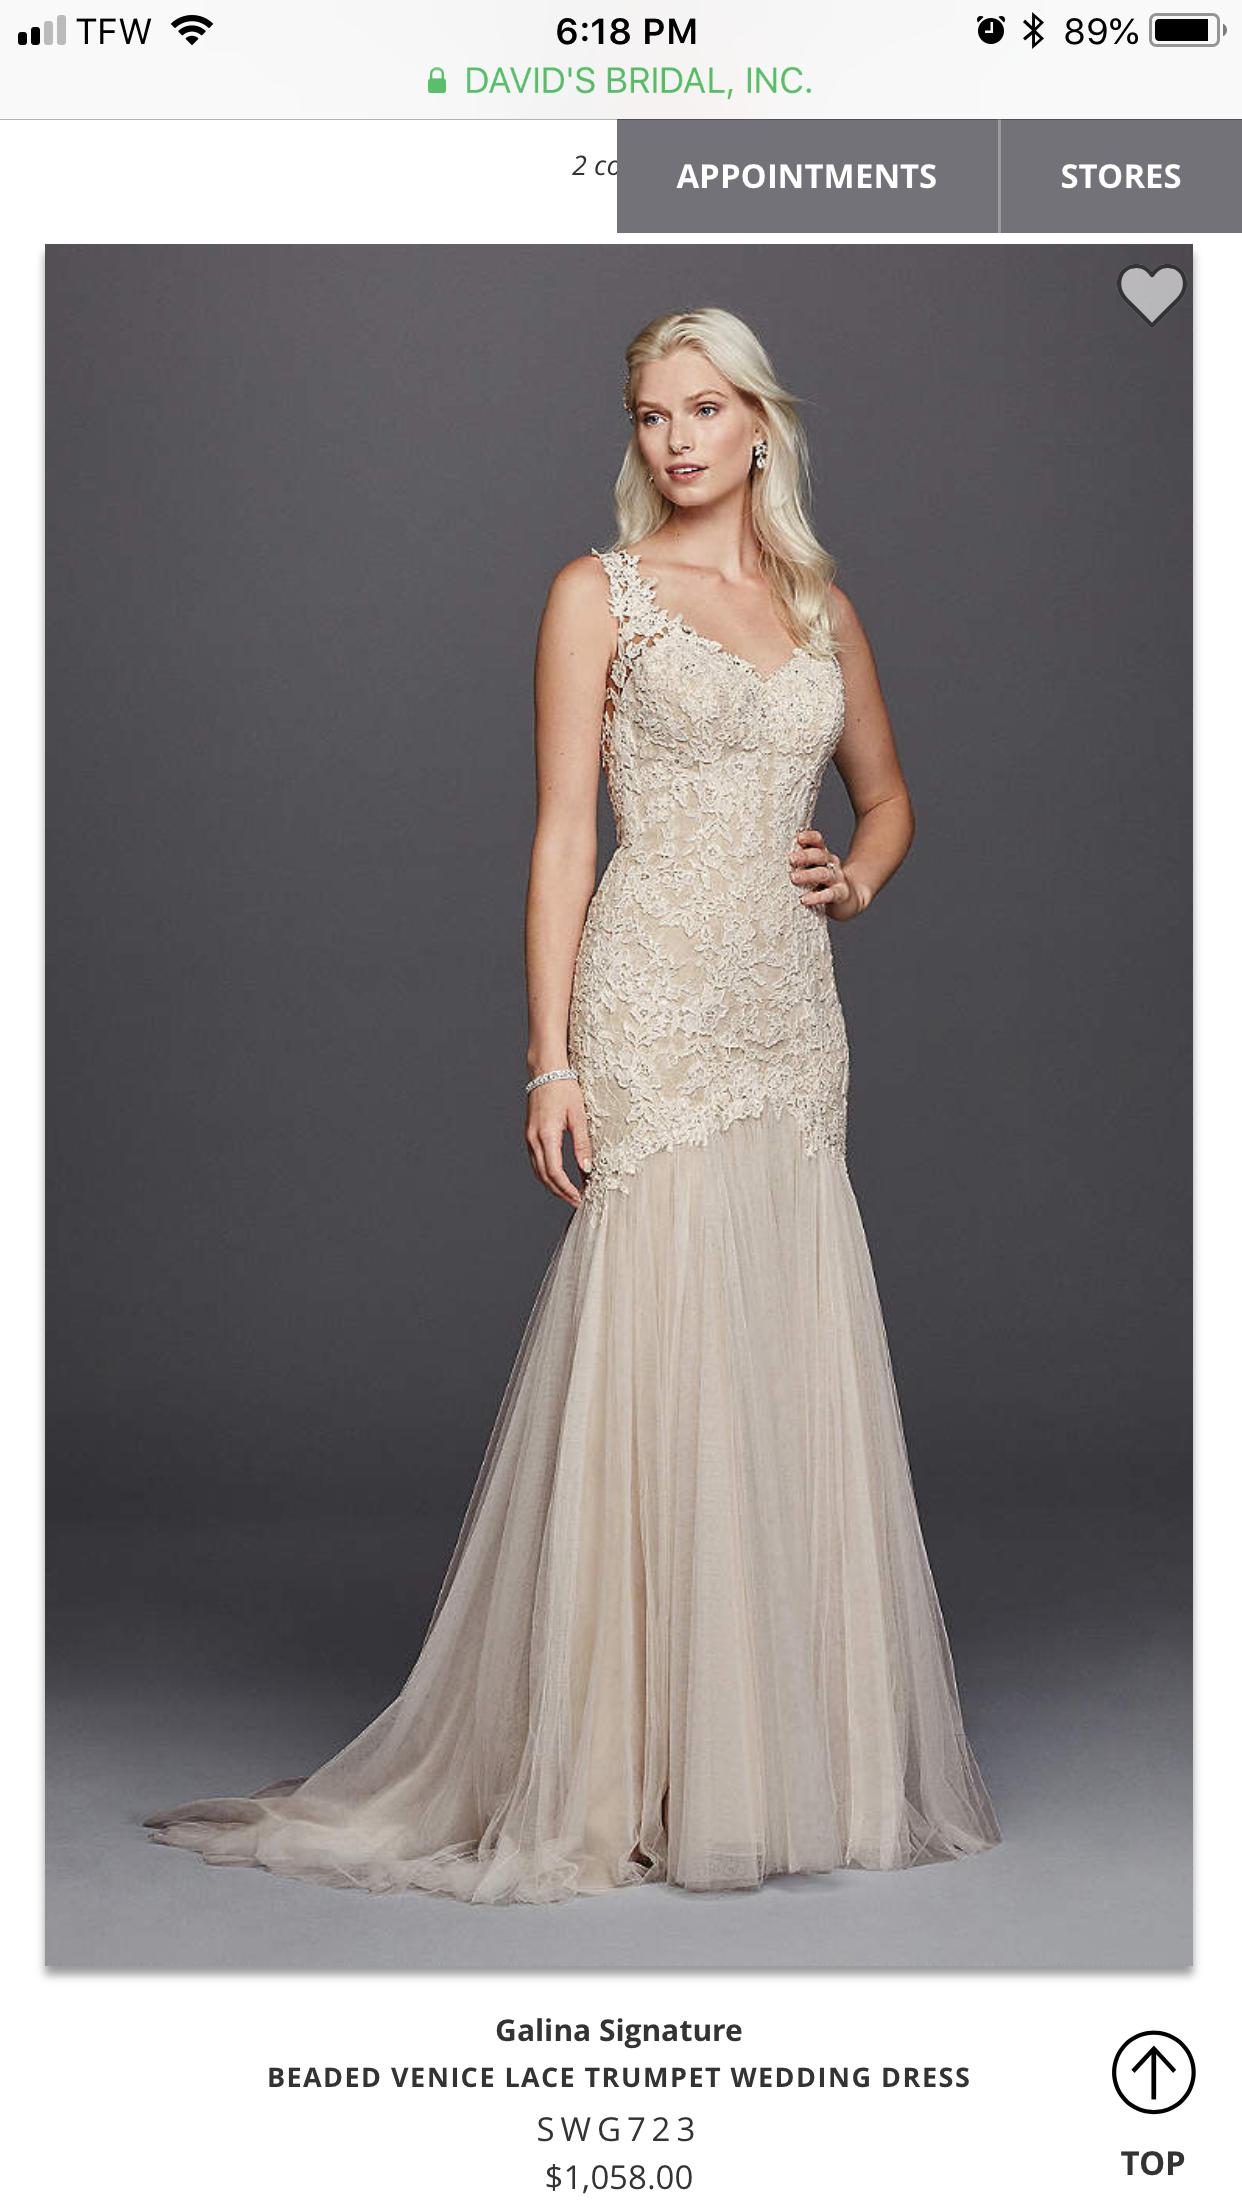 Galina signature wedding dress  Pin by Sabree on Dream wedding ideas in   Pinterest  Dream